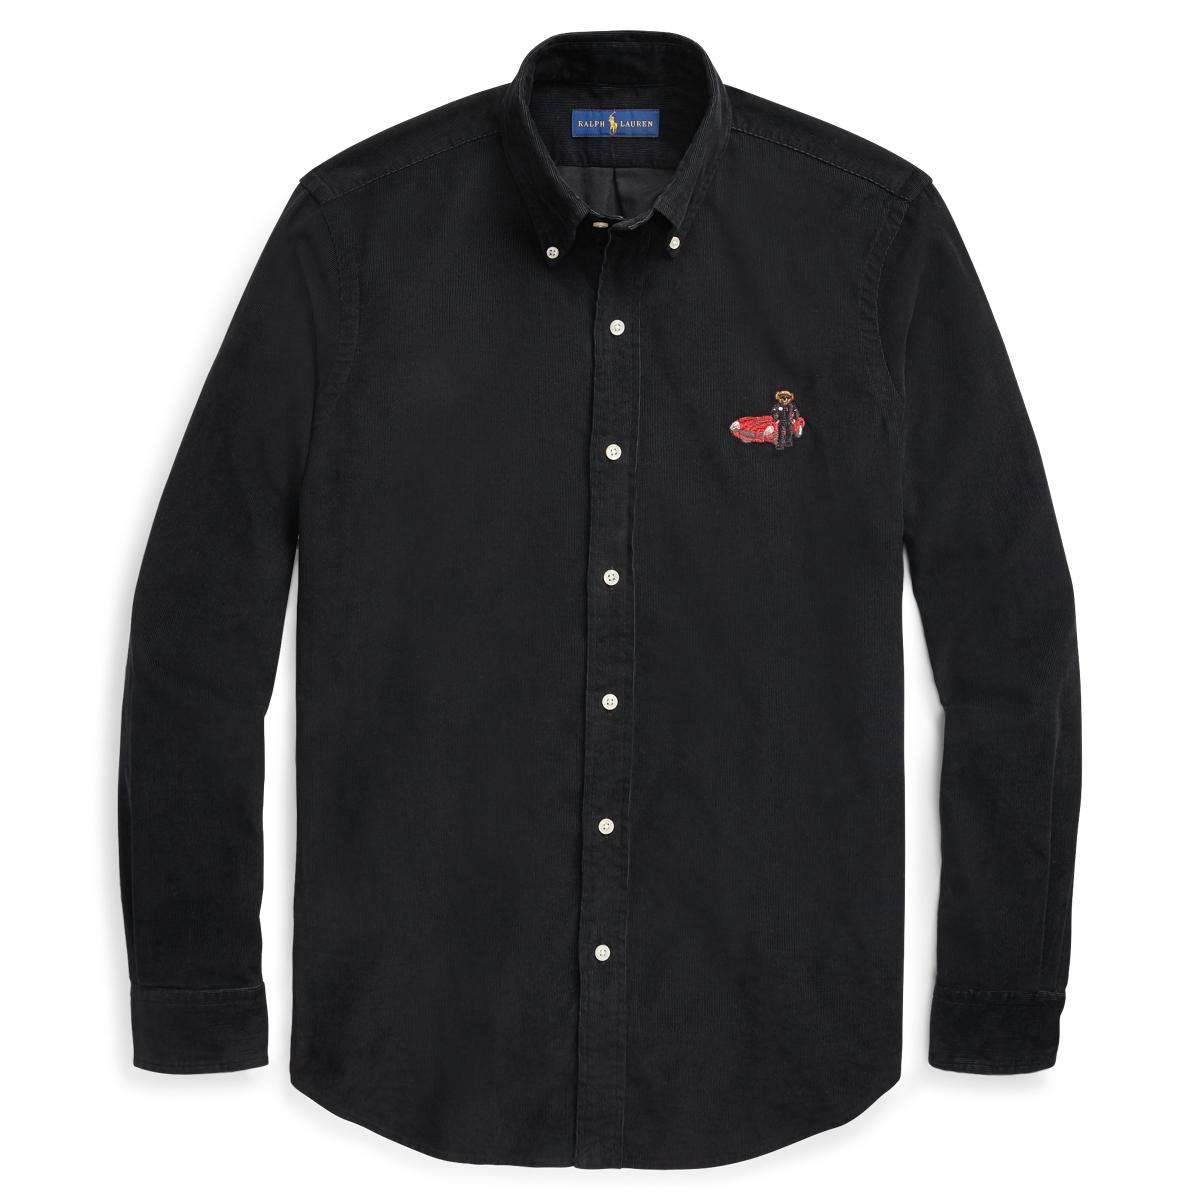 6002252bc1fb1 Polo Classic Dress Shirts